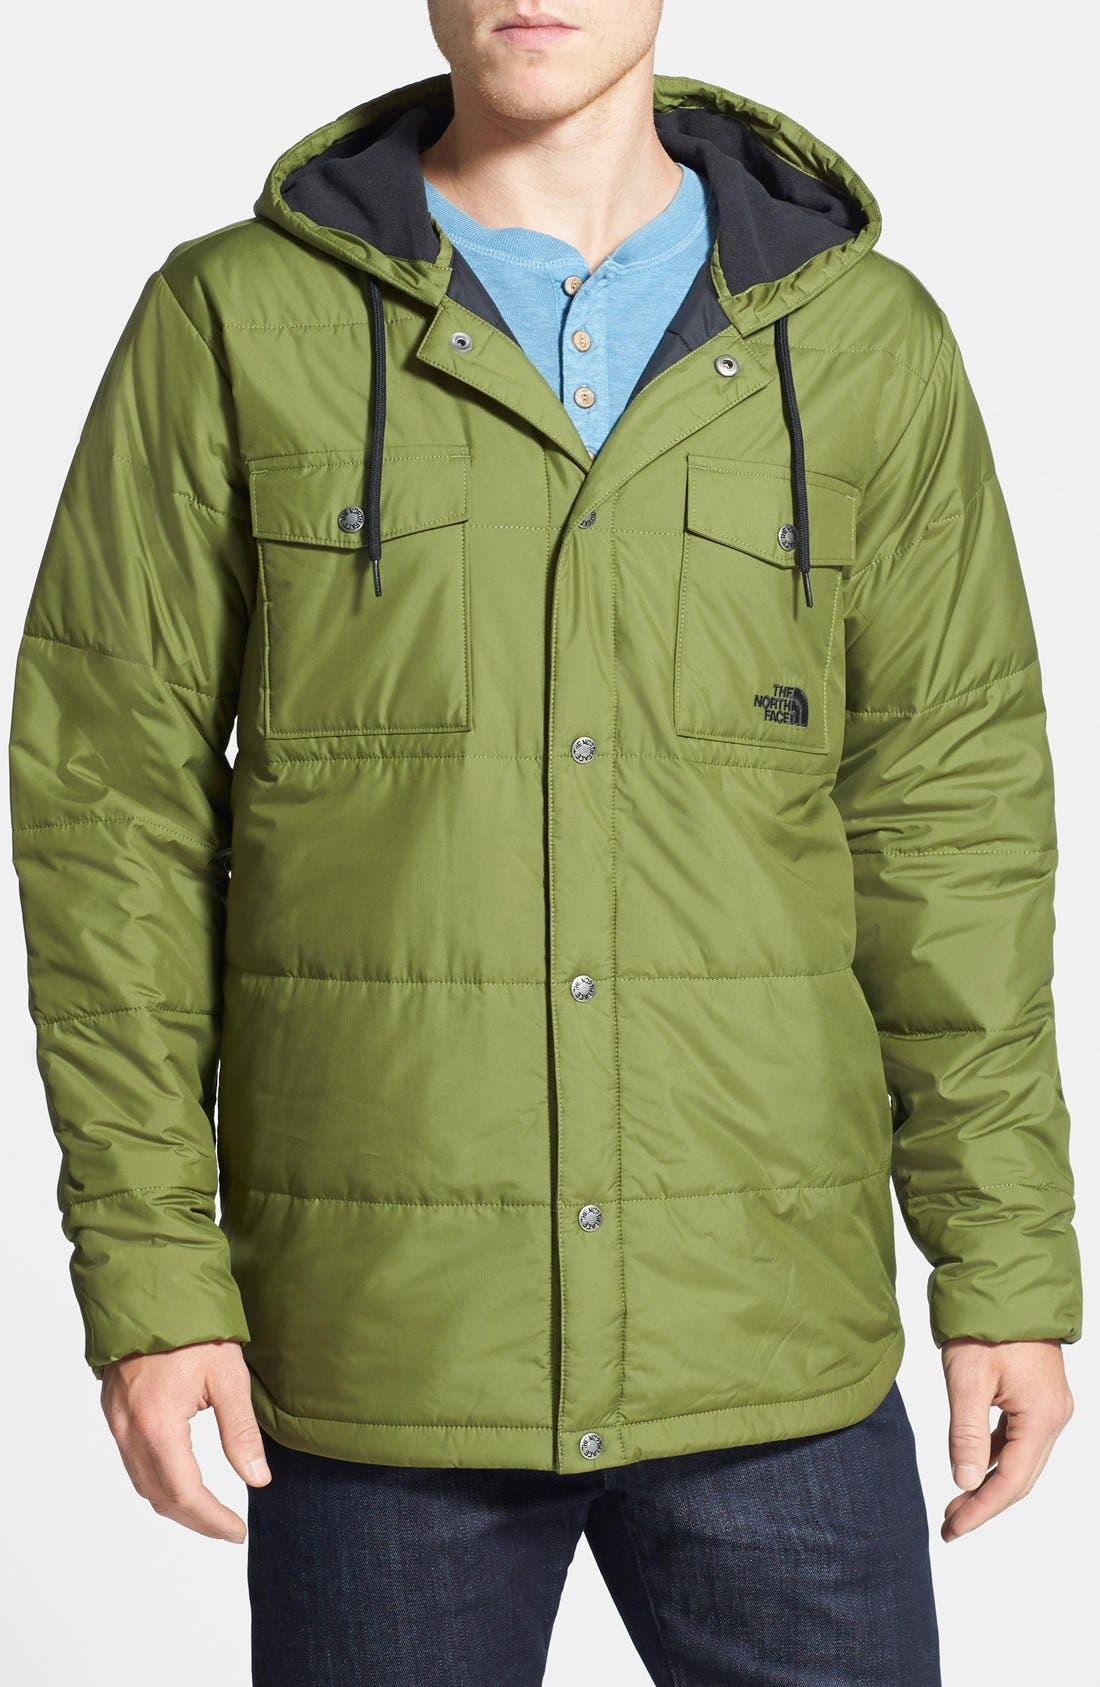 Alternate Image 1 Selected - The North Face 'Meeks' Water Resistant Heatseeker Insulated Jacket